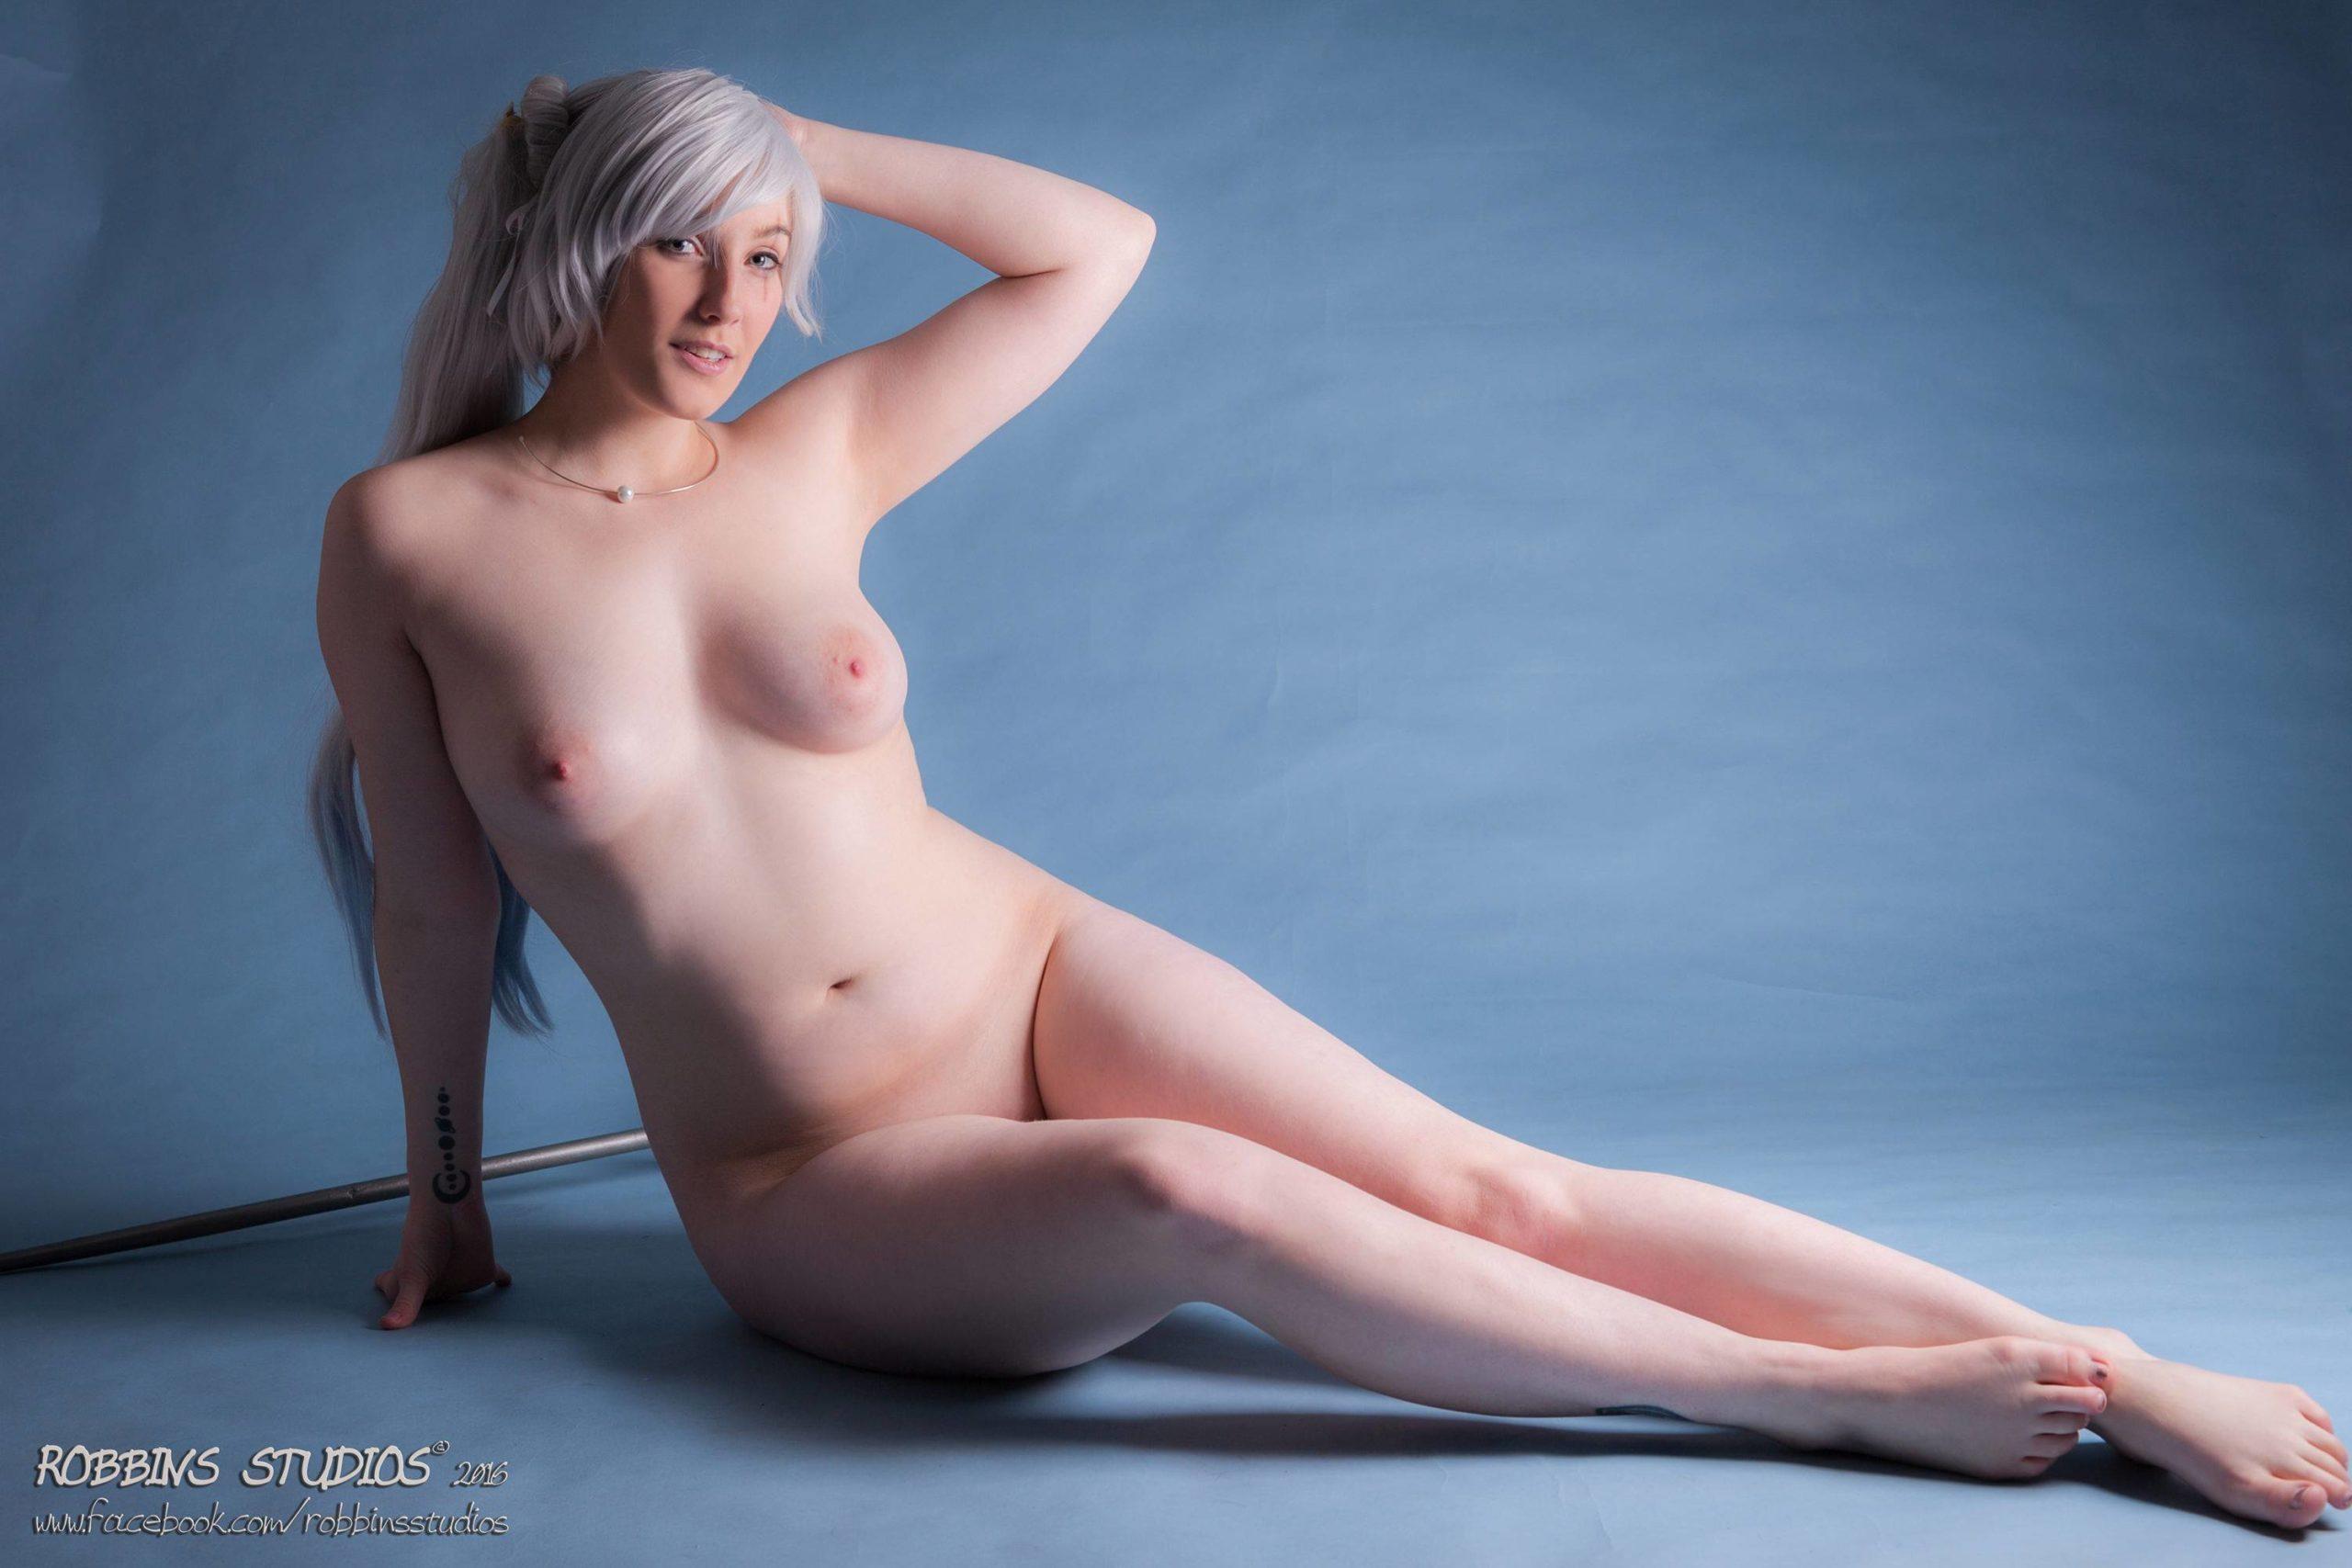 Microkitty Patreon Nude Photos Leaks 0004